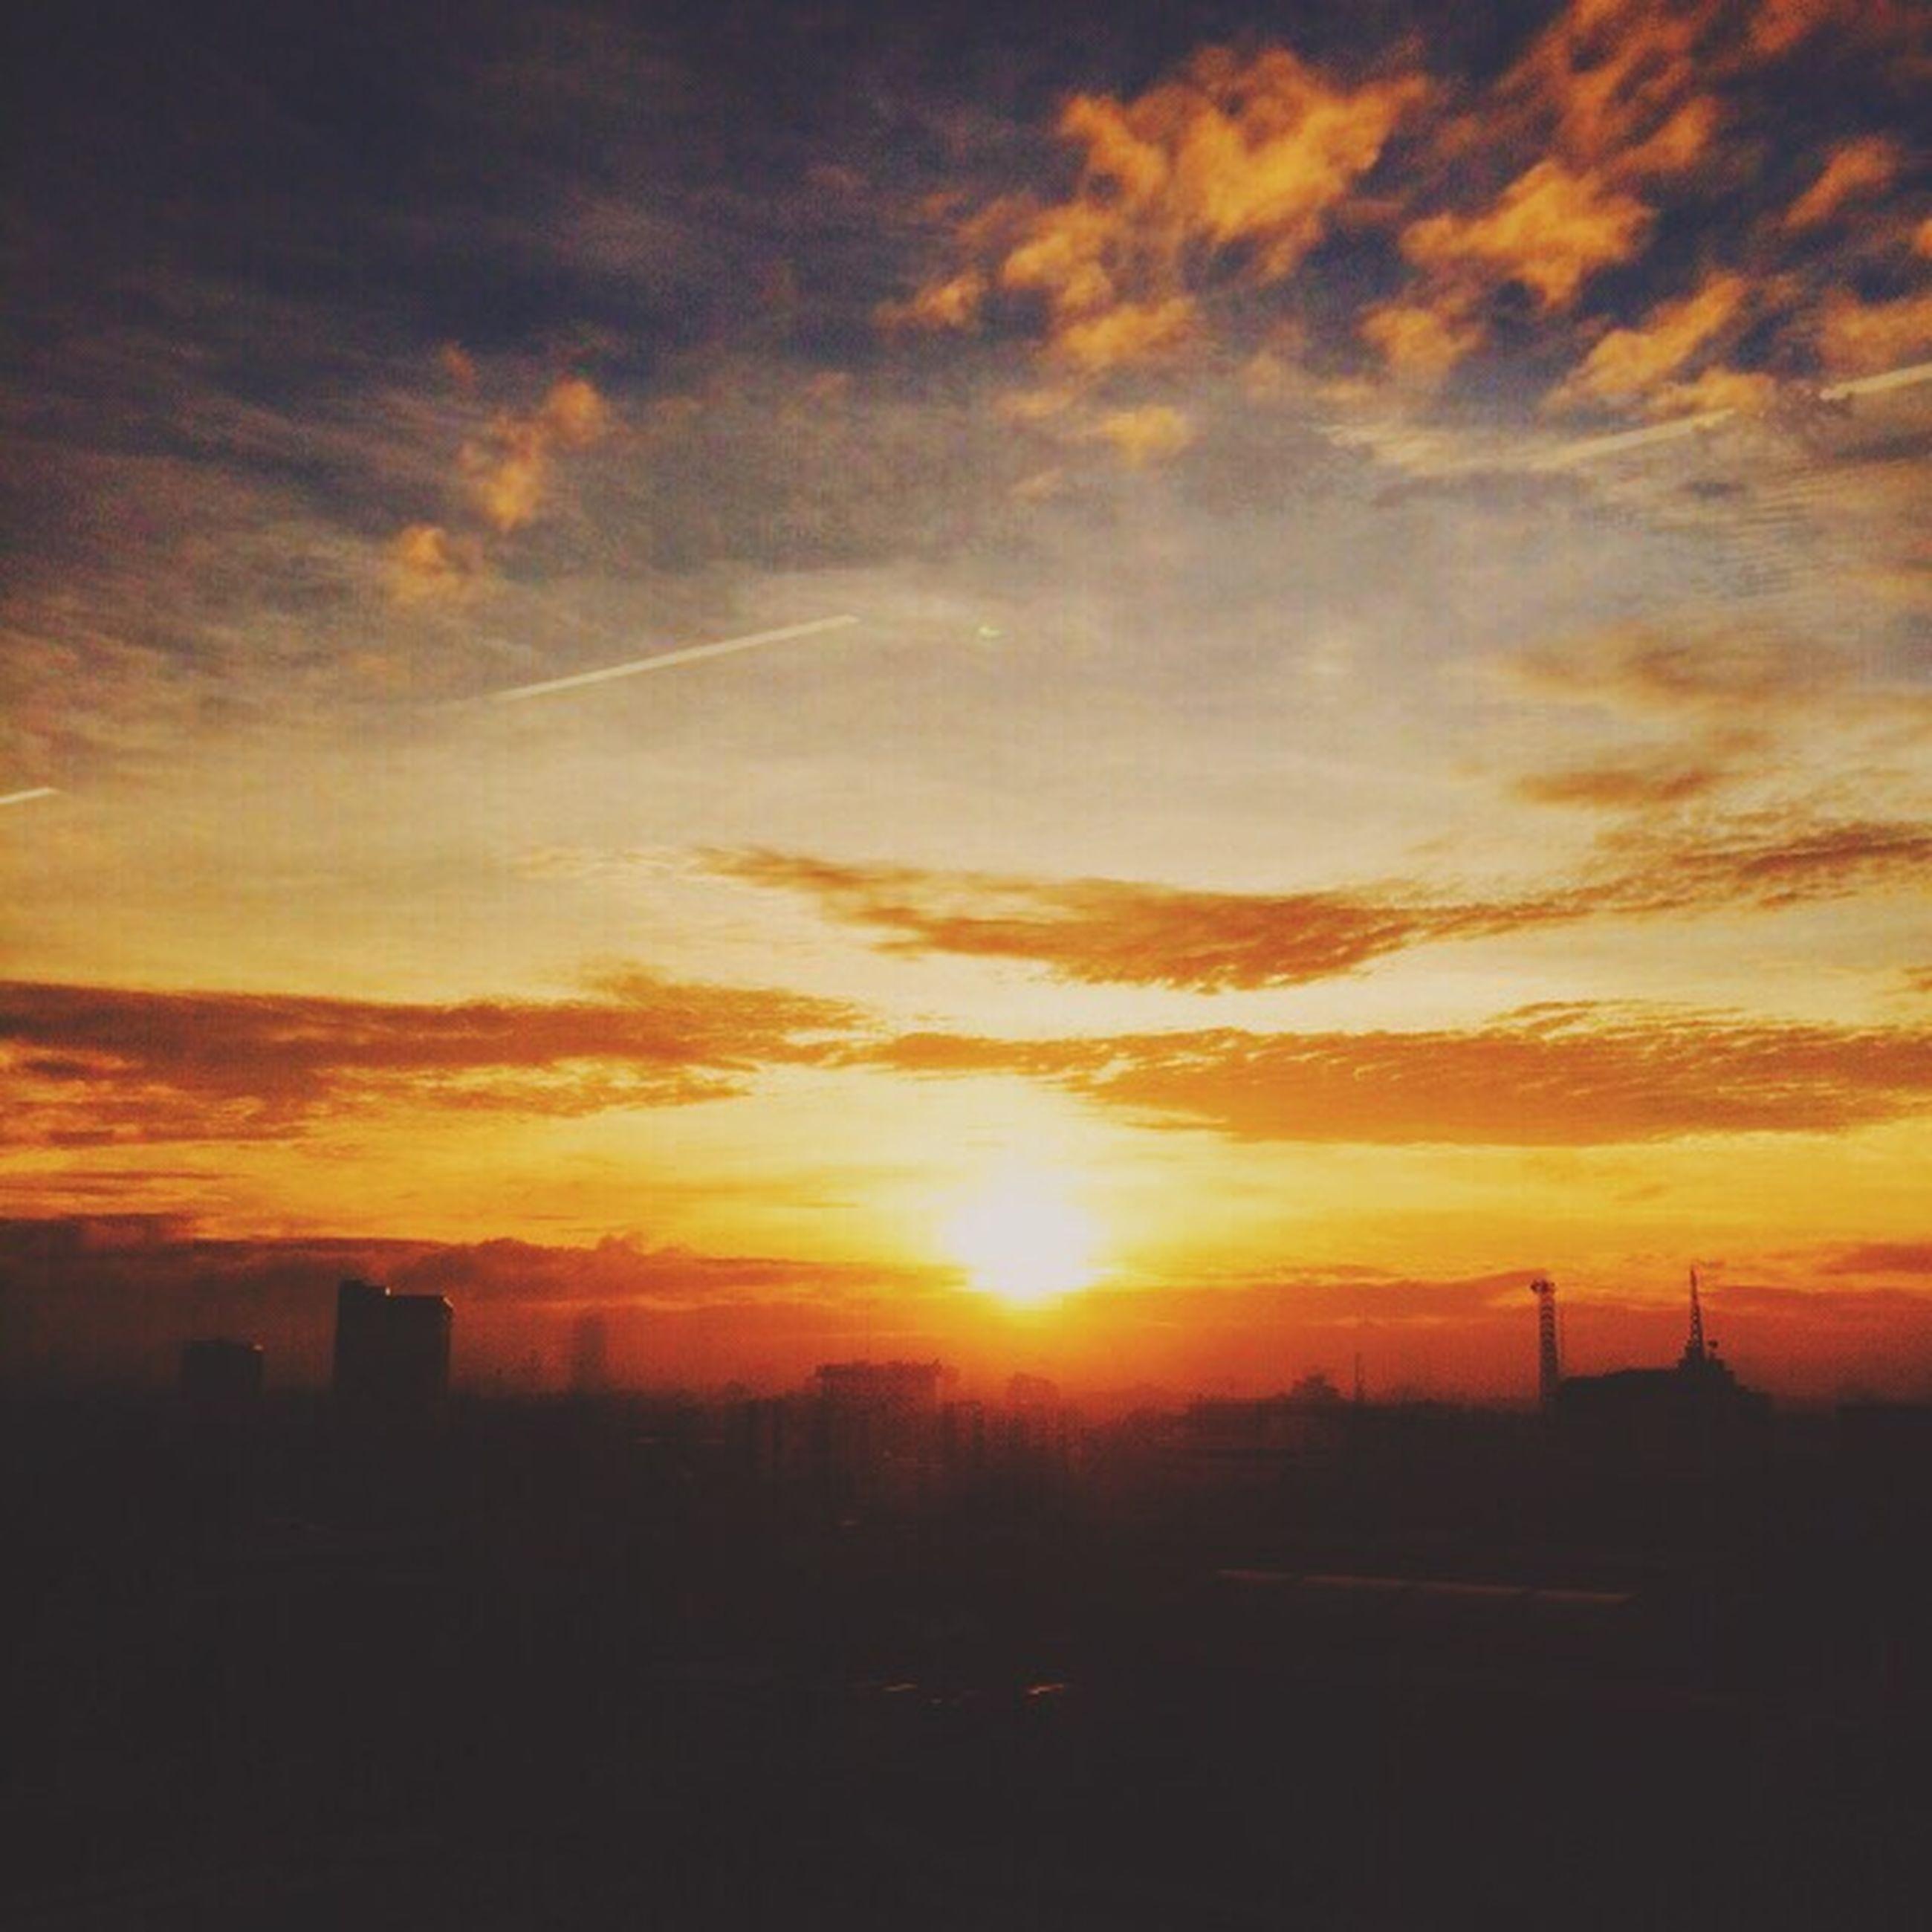 sunset, silhouette, orange color, sky, cloud - sky, beauty in nature, scenics, sun, building exterior, dramatic sky, built structure, architecture, nature, cloudy, cloud, idyllic, tranquility, tranquil scene, landscape, sunlight